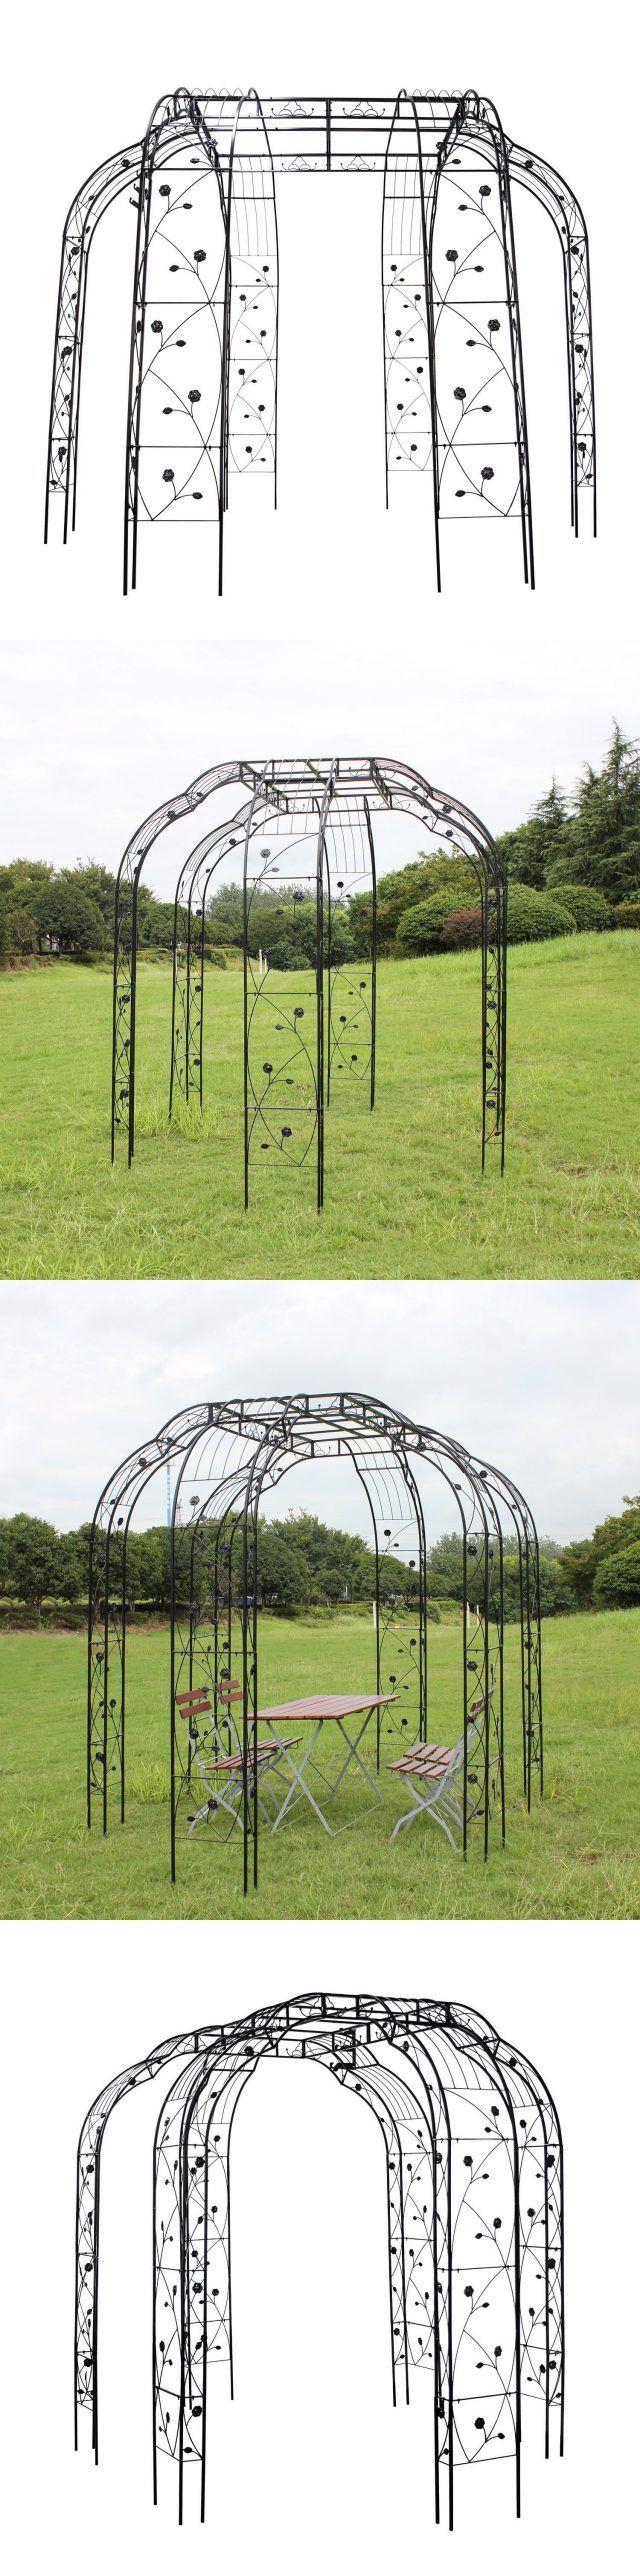 Arbors and Arches 180993: 8.2 Metal Garden Pergola Arch Flower Archway Arbor Cli...#arbor #arbors #arch #arches #archway #cli #flower #garden #metal #pergola